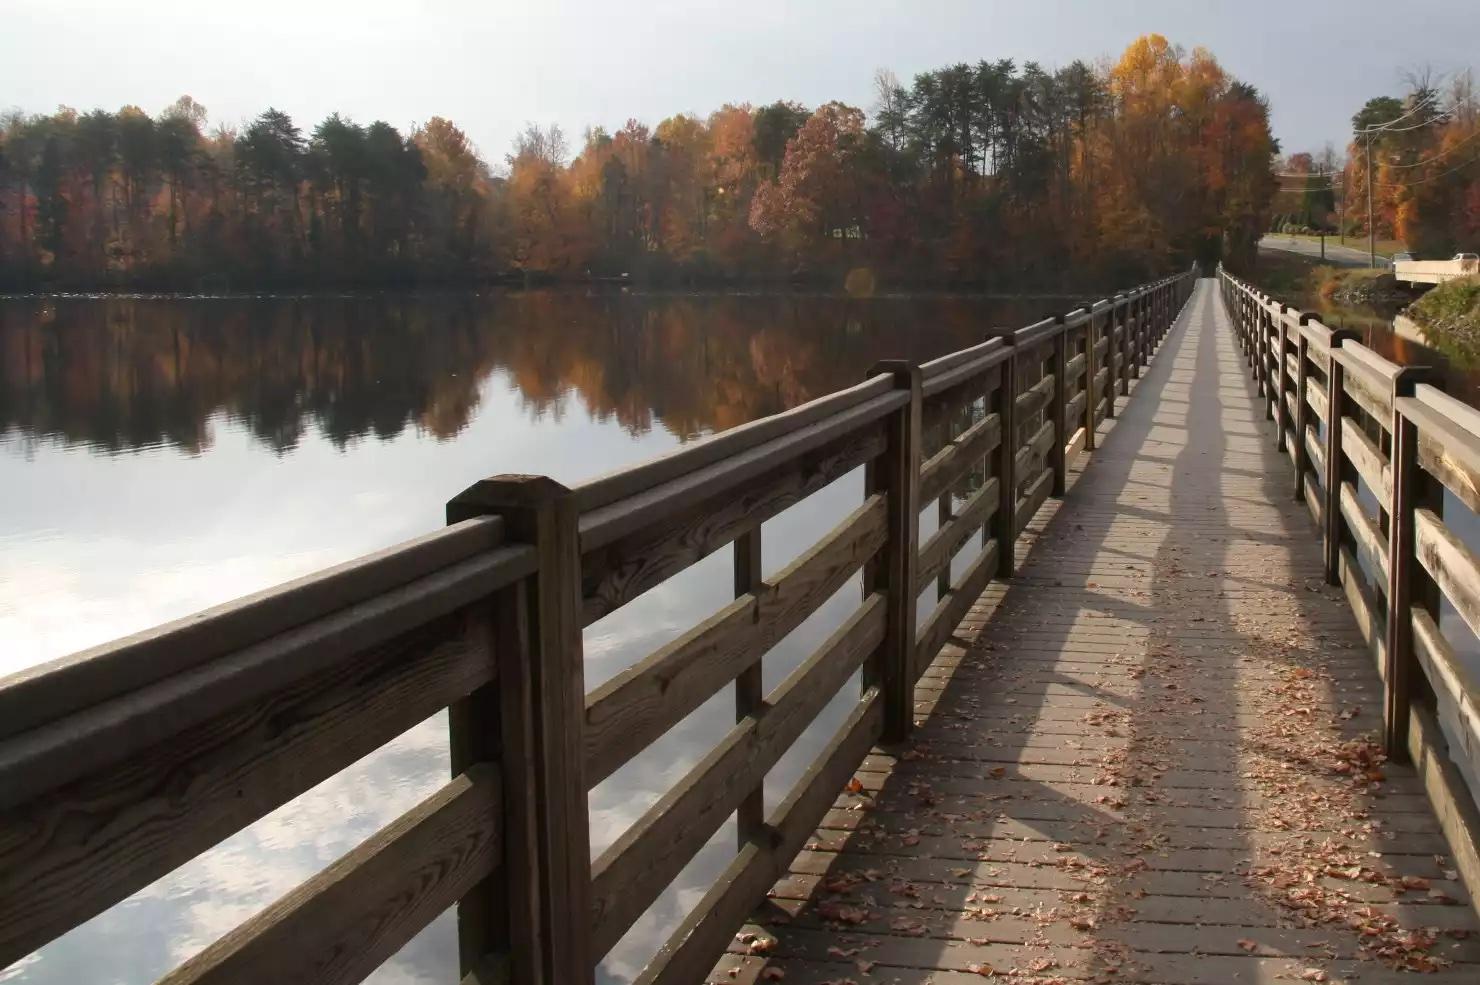 Lake Jeanette, Greensboro, North Carolina